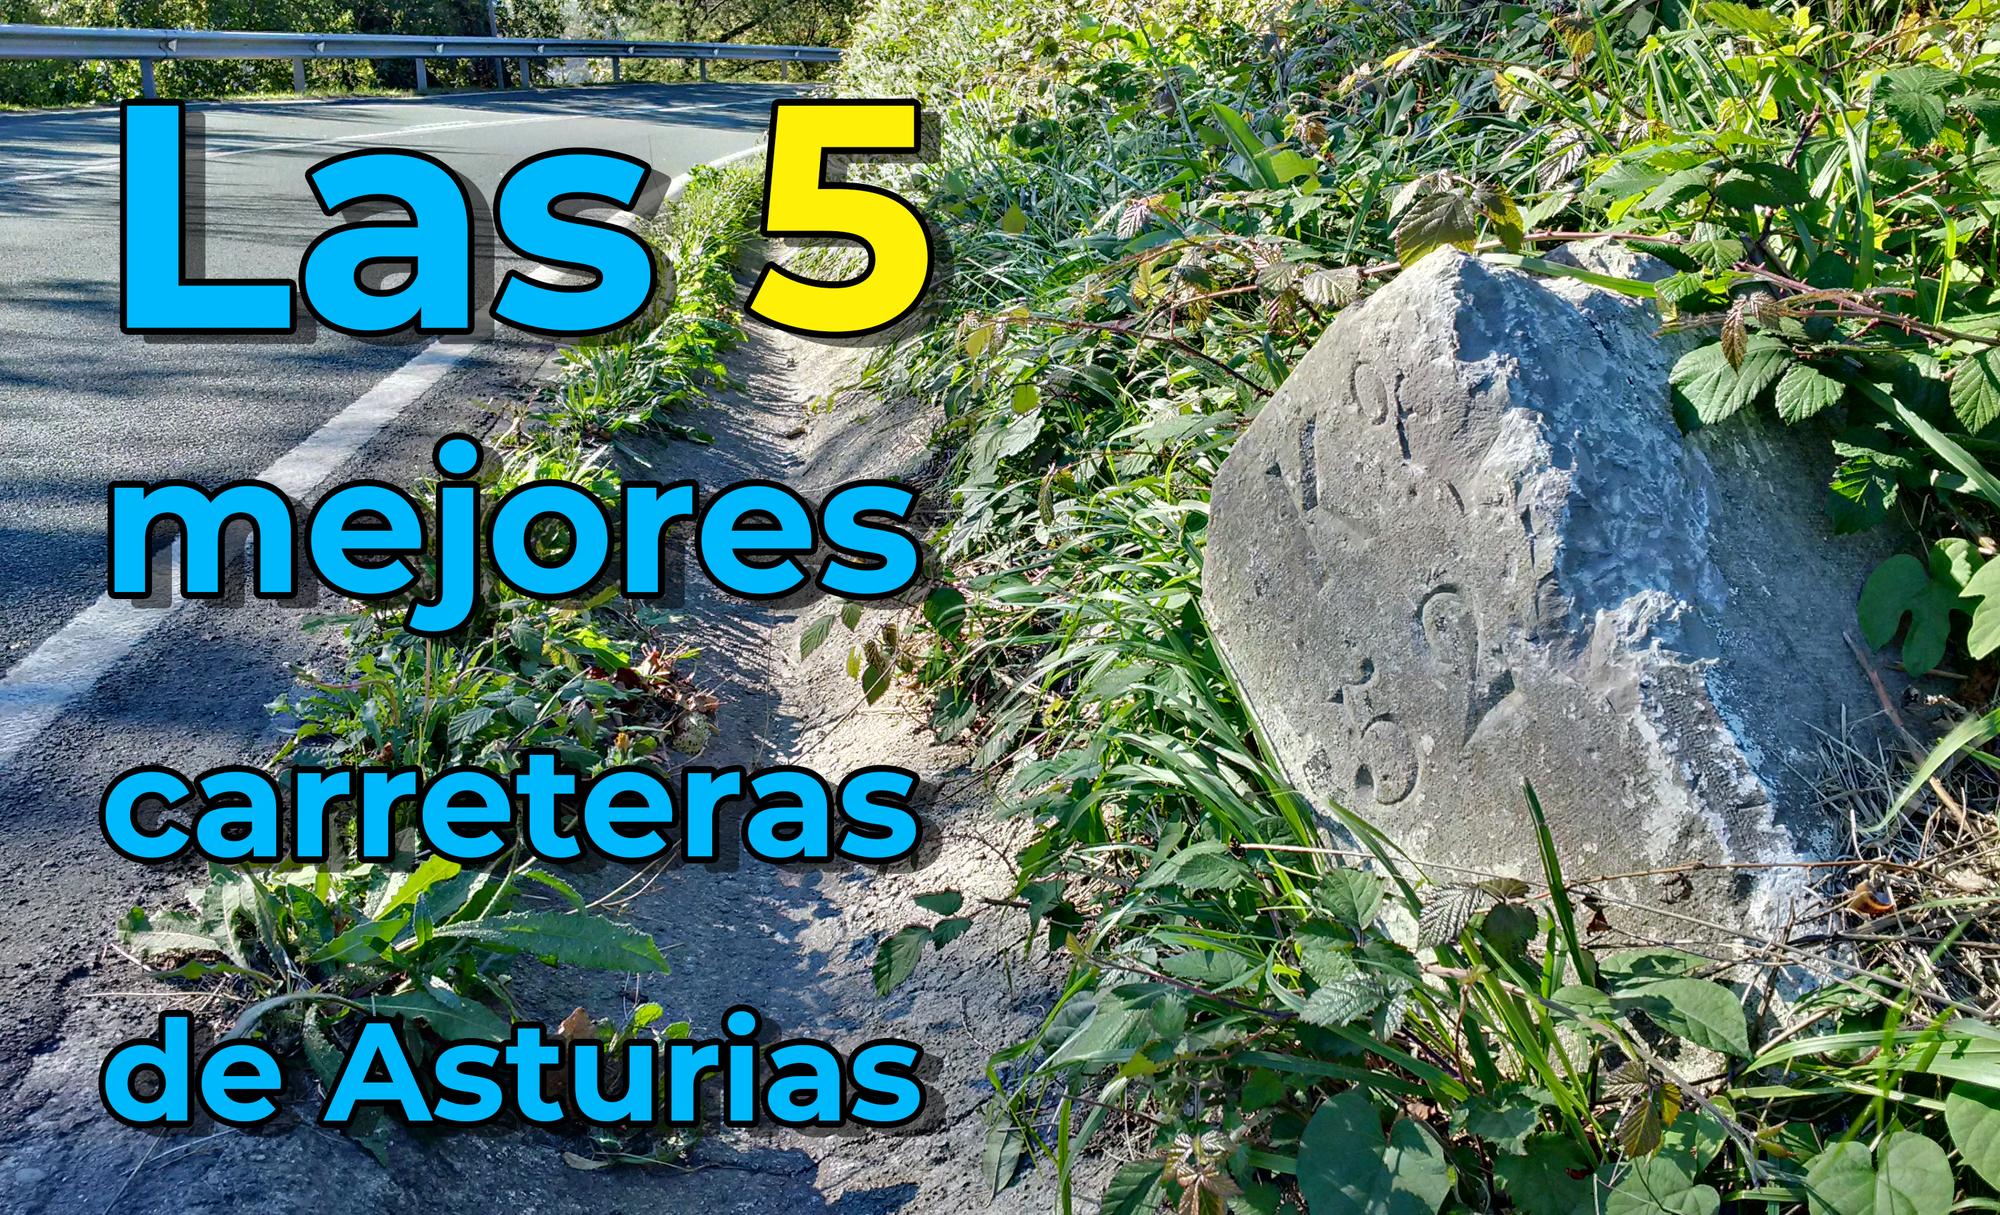 Las 5 mejores carreteras de Asturias